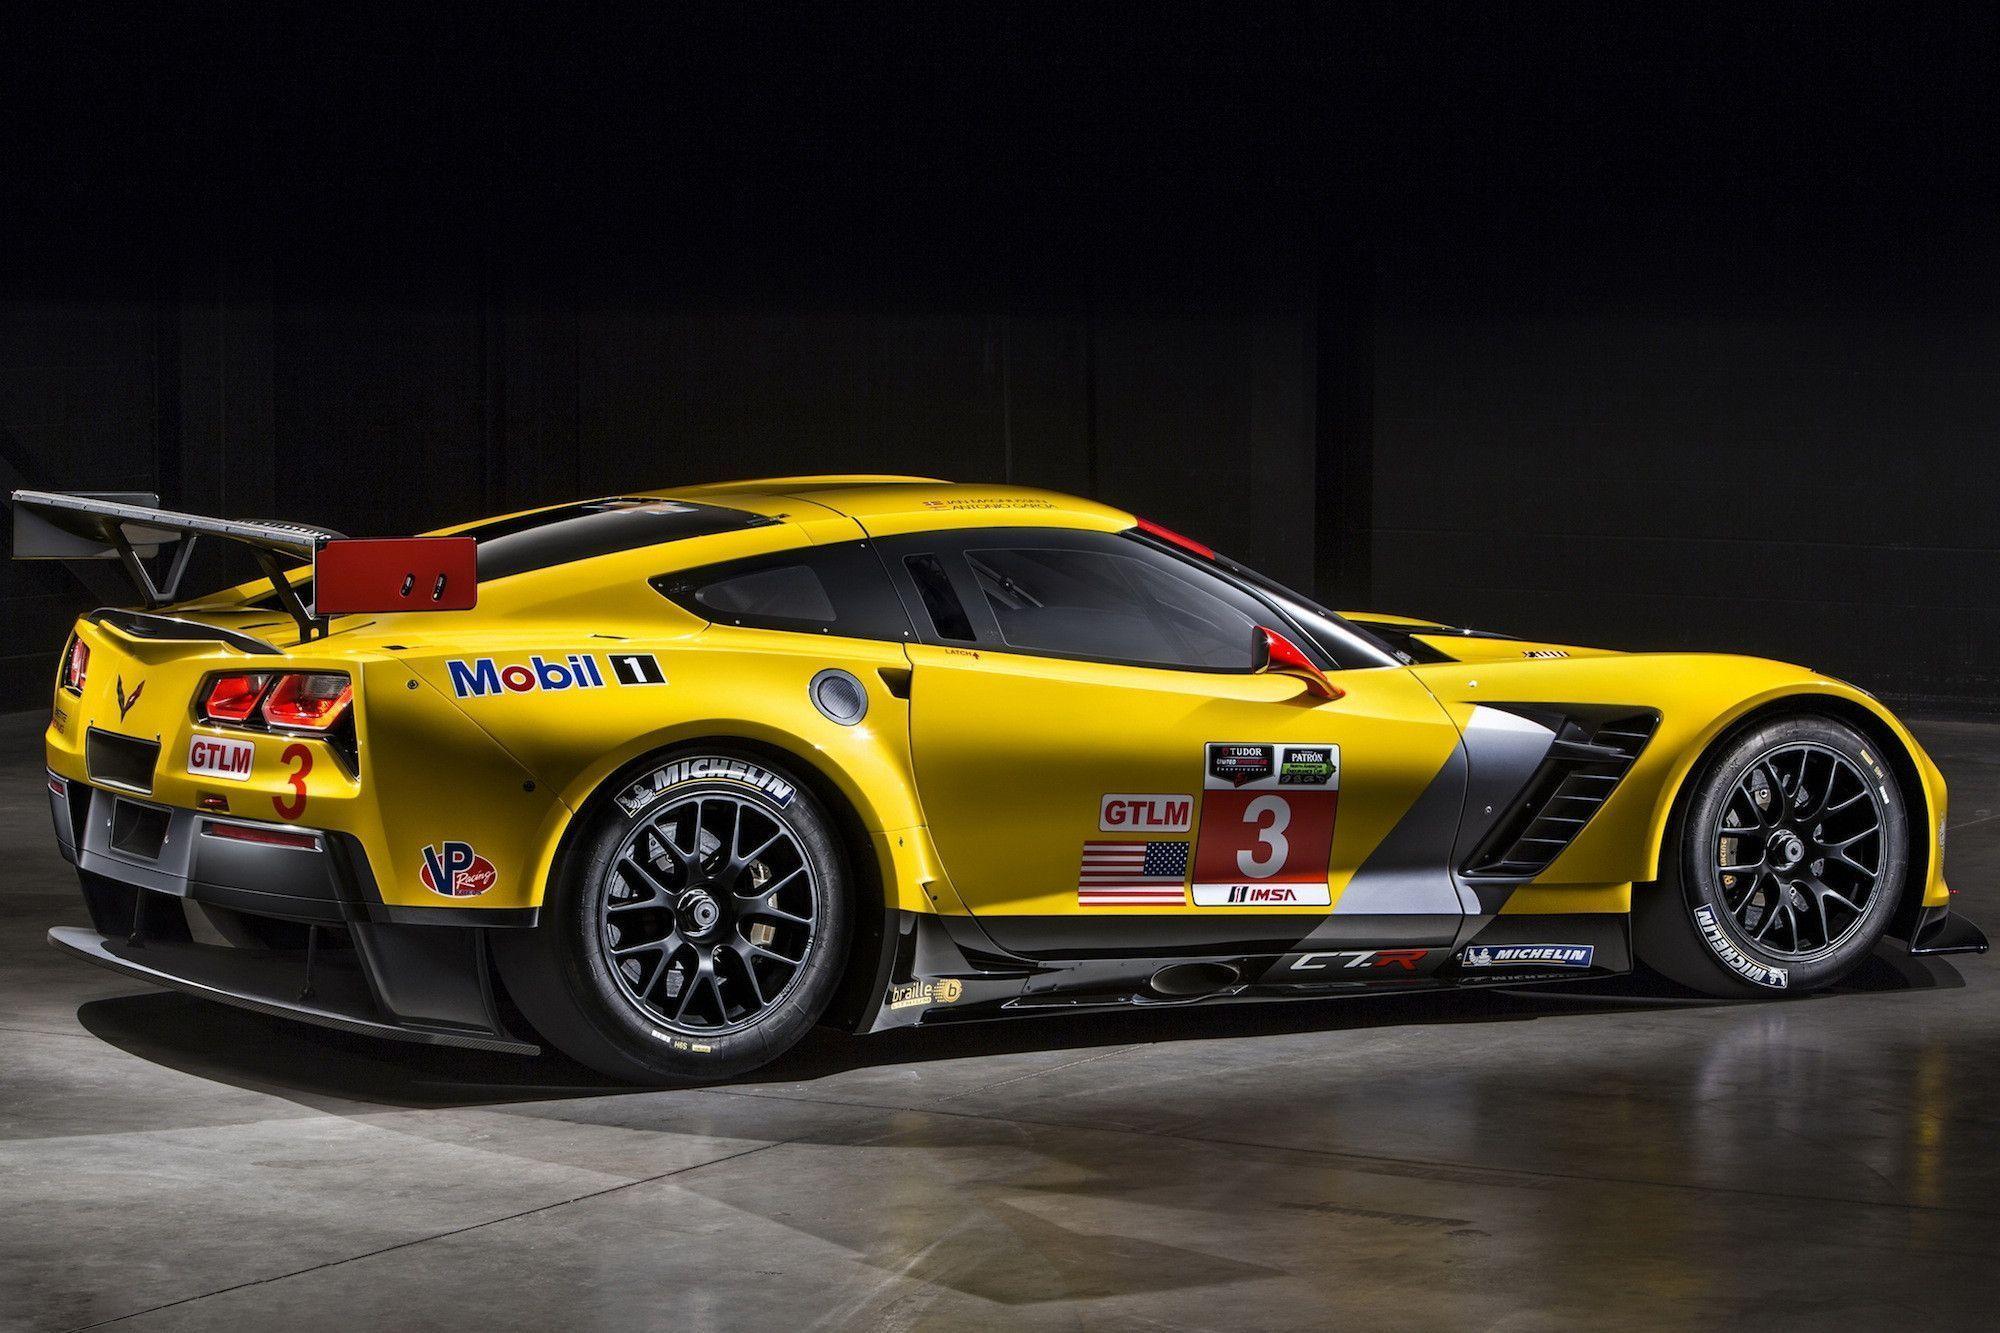 Corvette C7 Wallpaper Hd